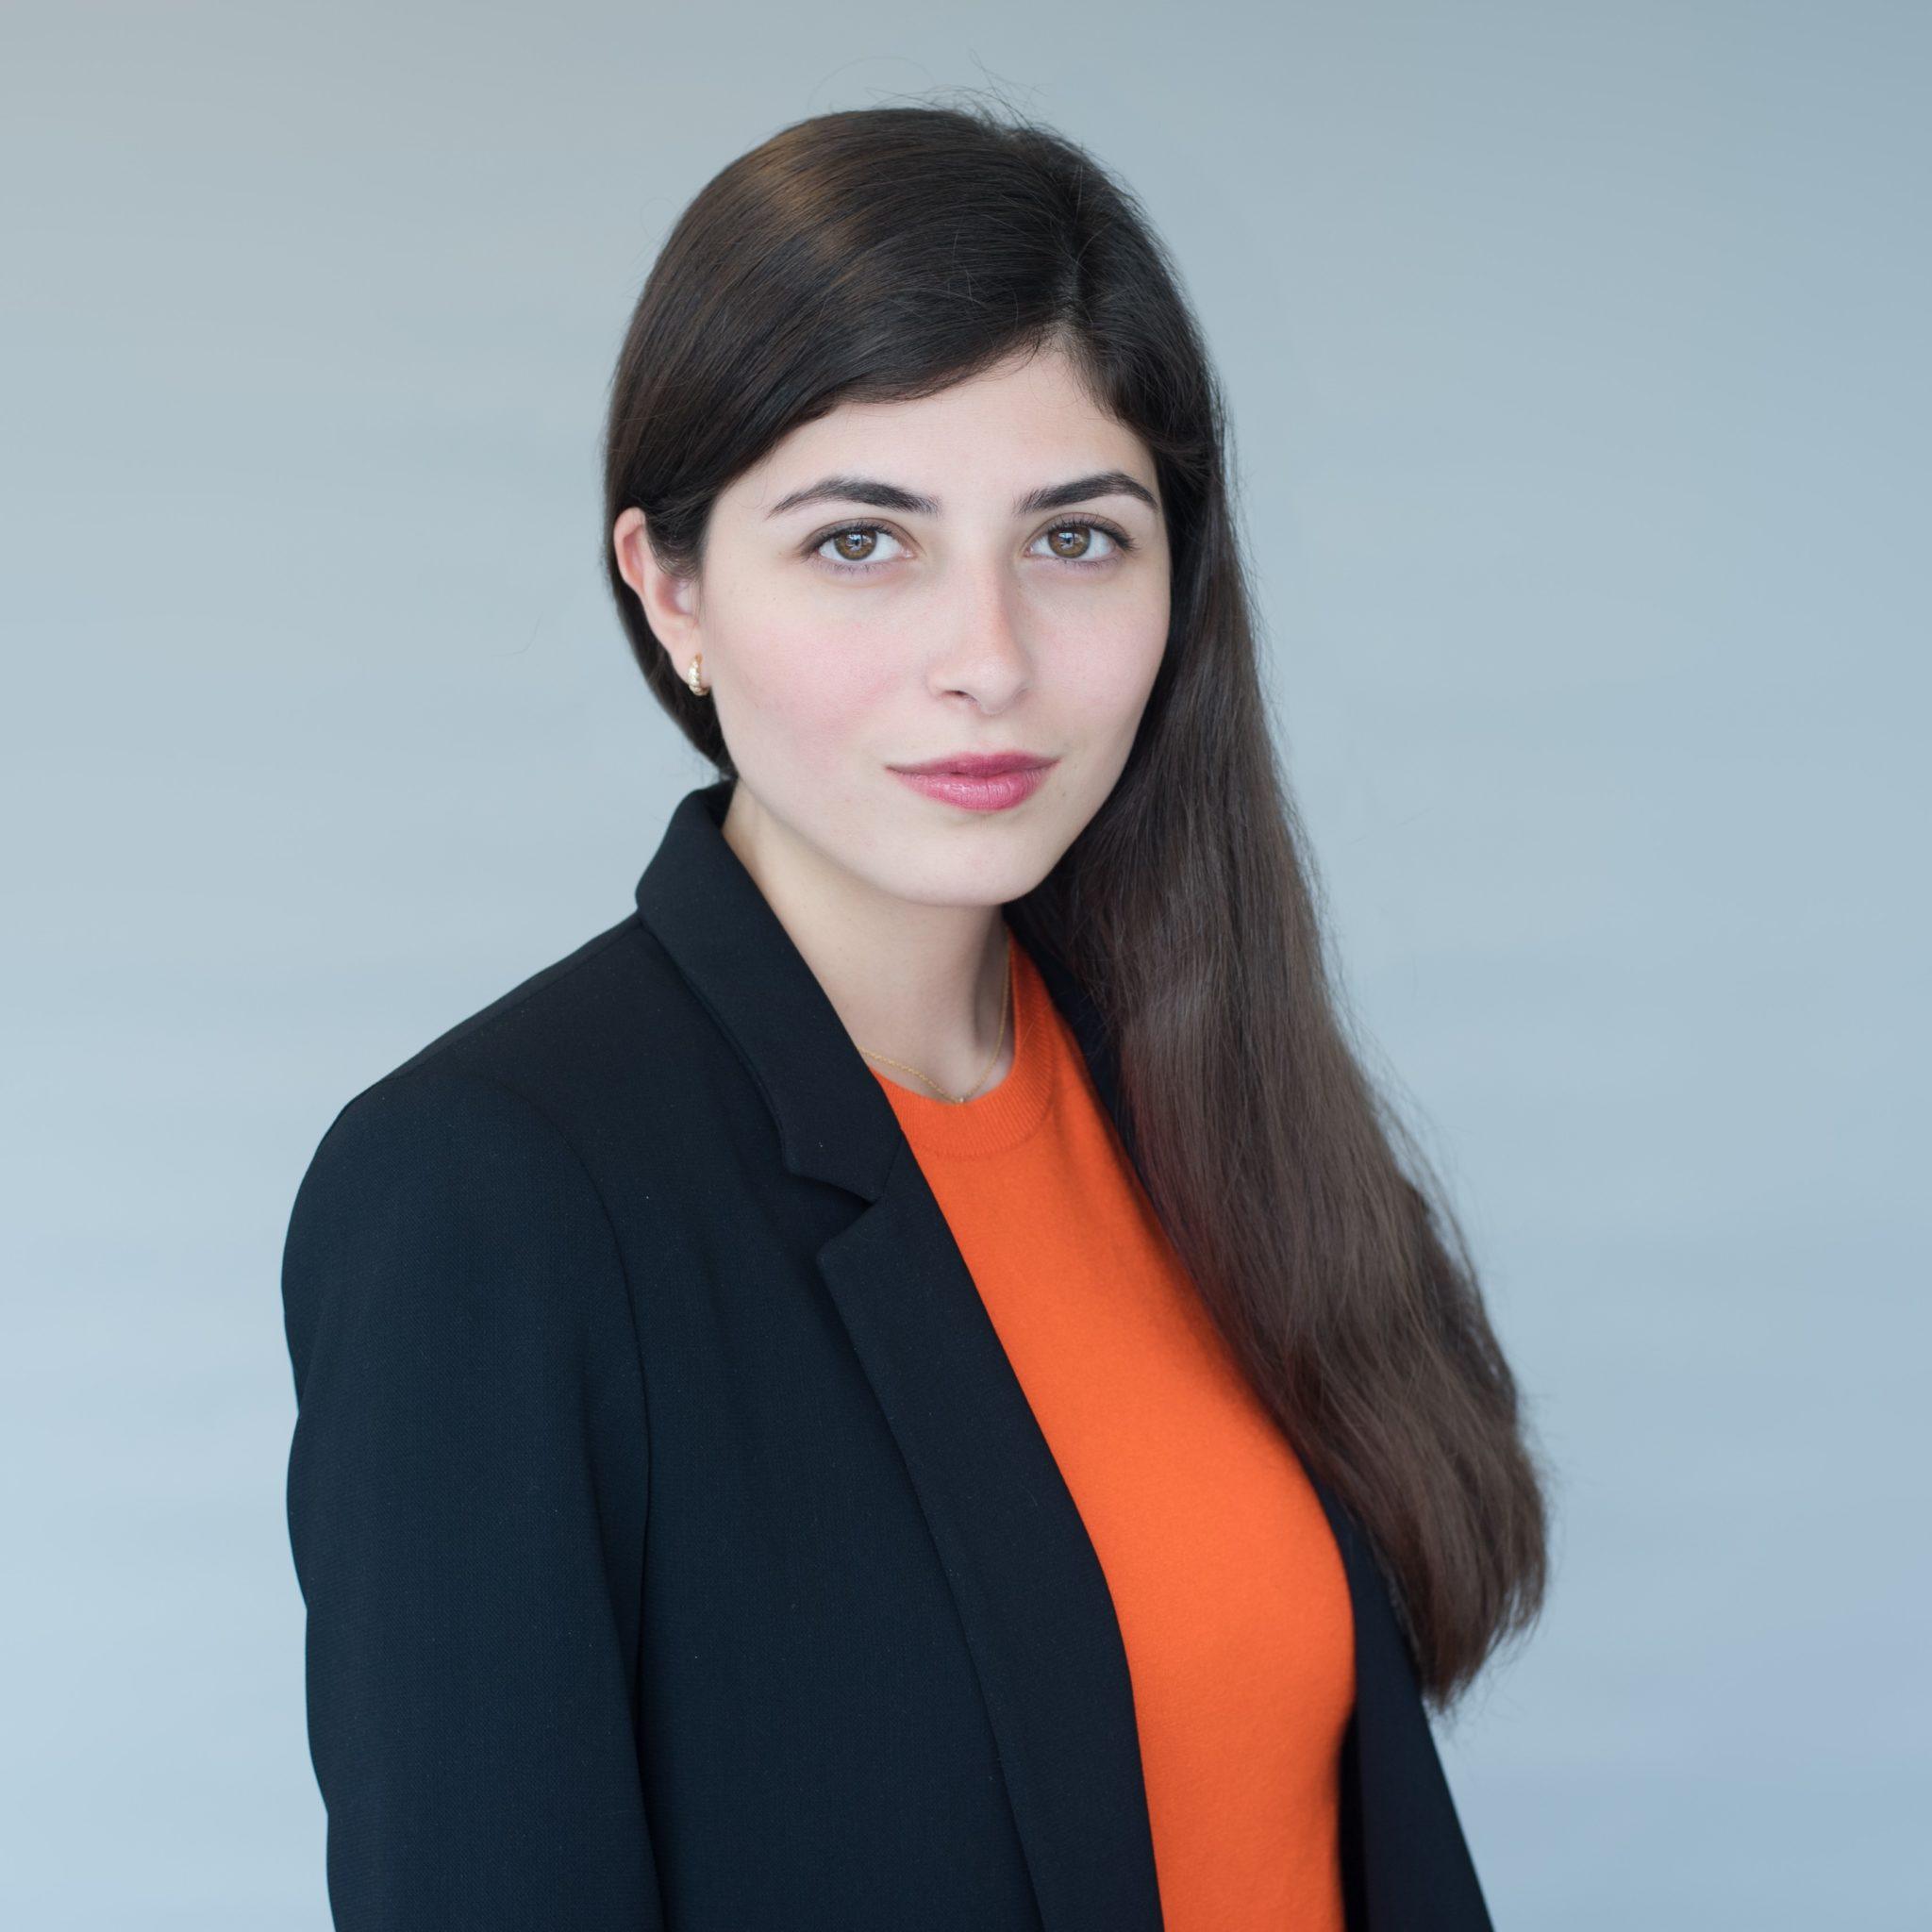 Nayla-Joy Zein